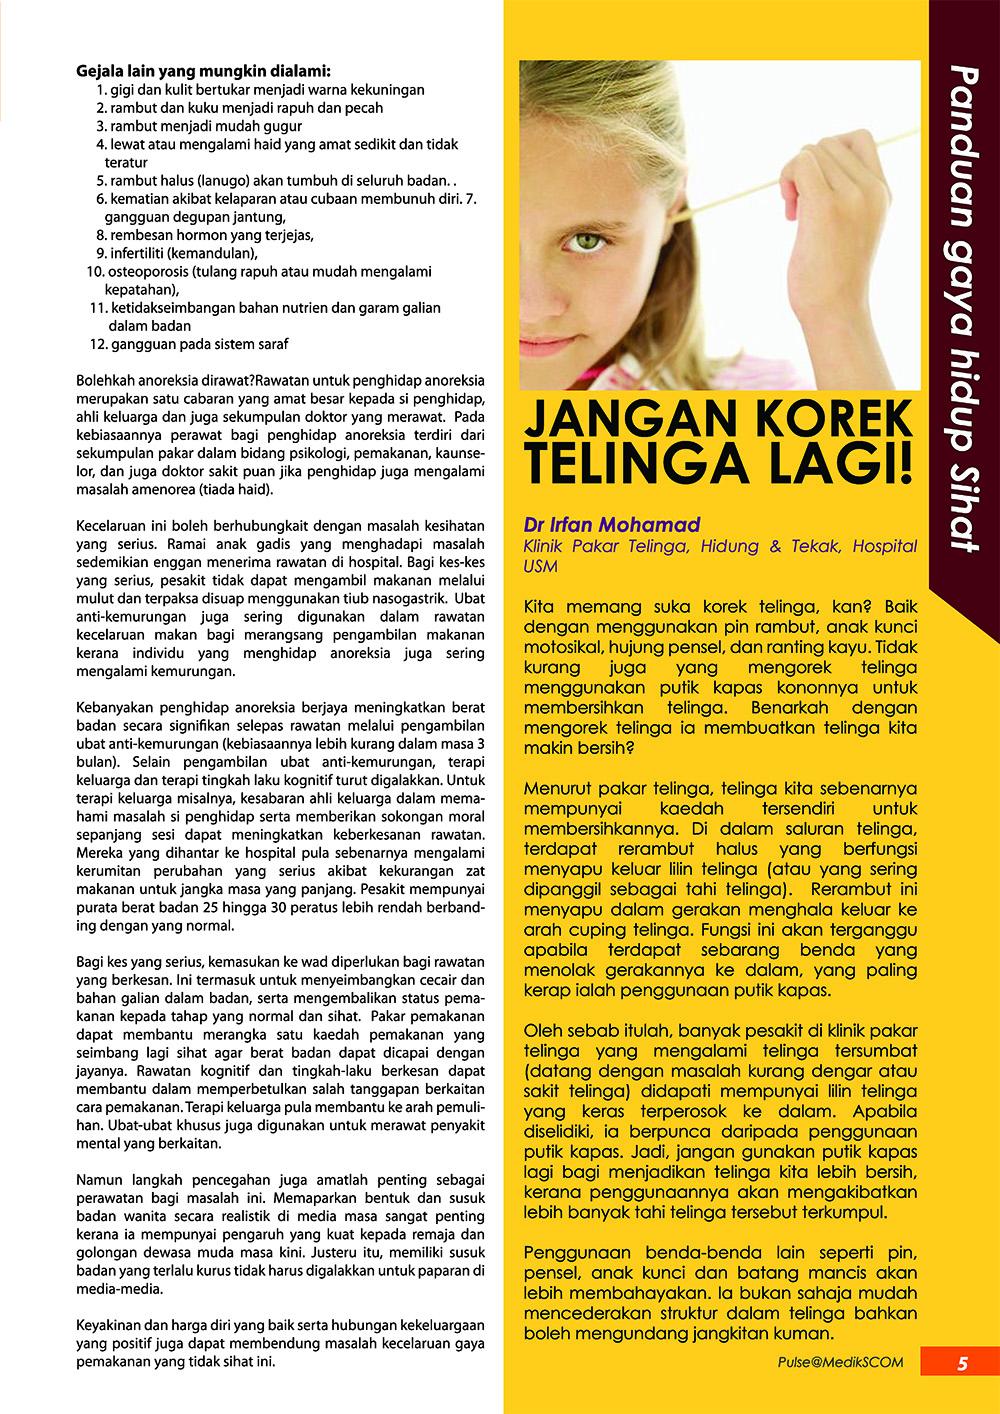 pulsemedikscomcommunitydec2013-1_page_5